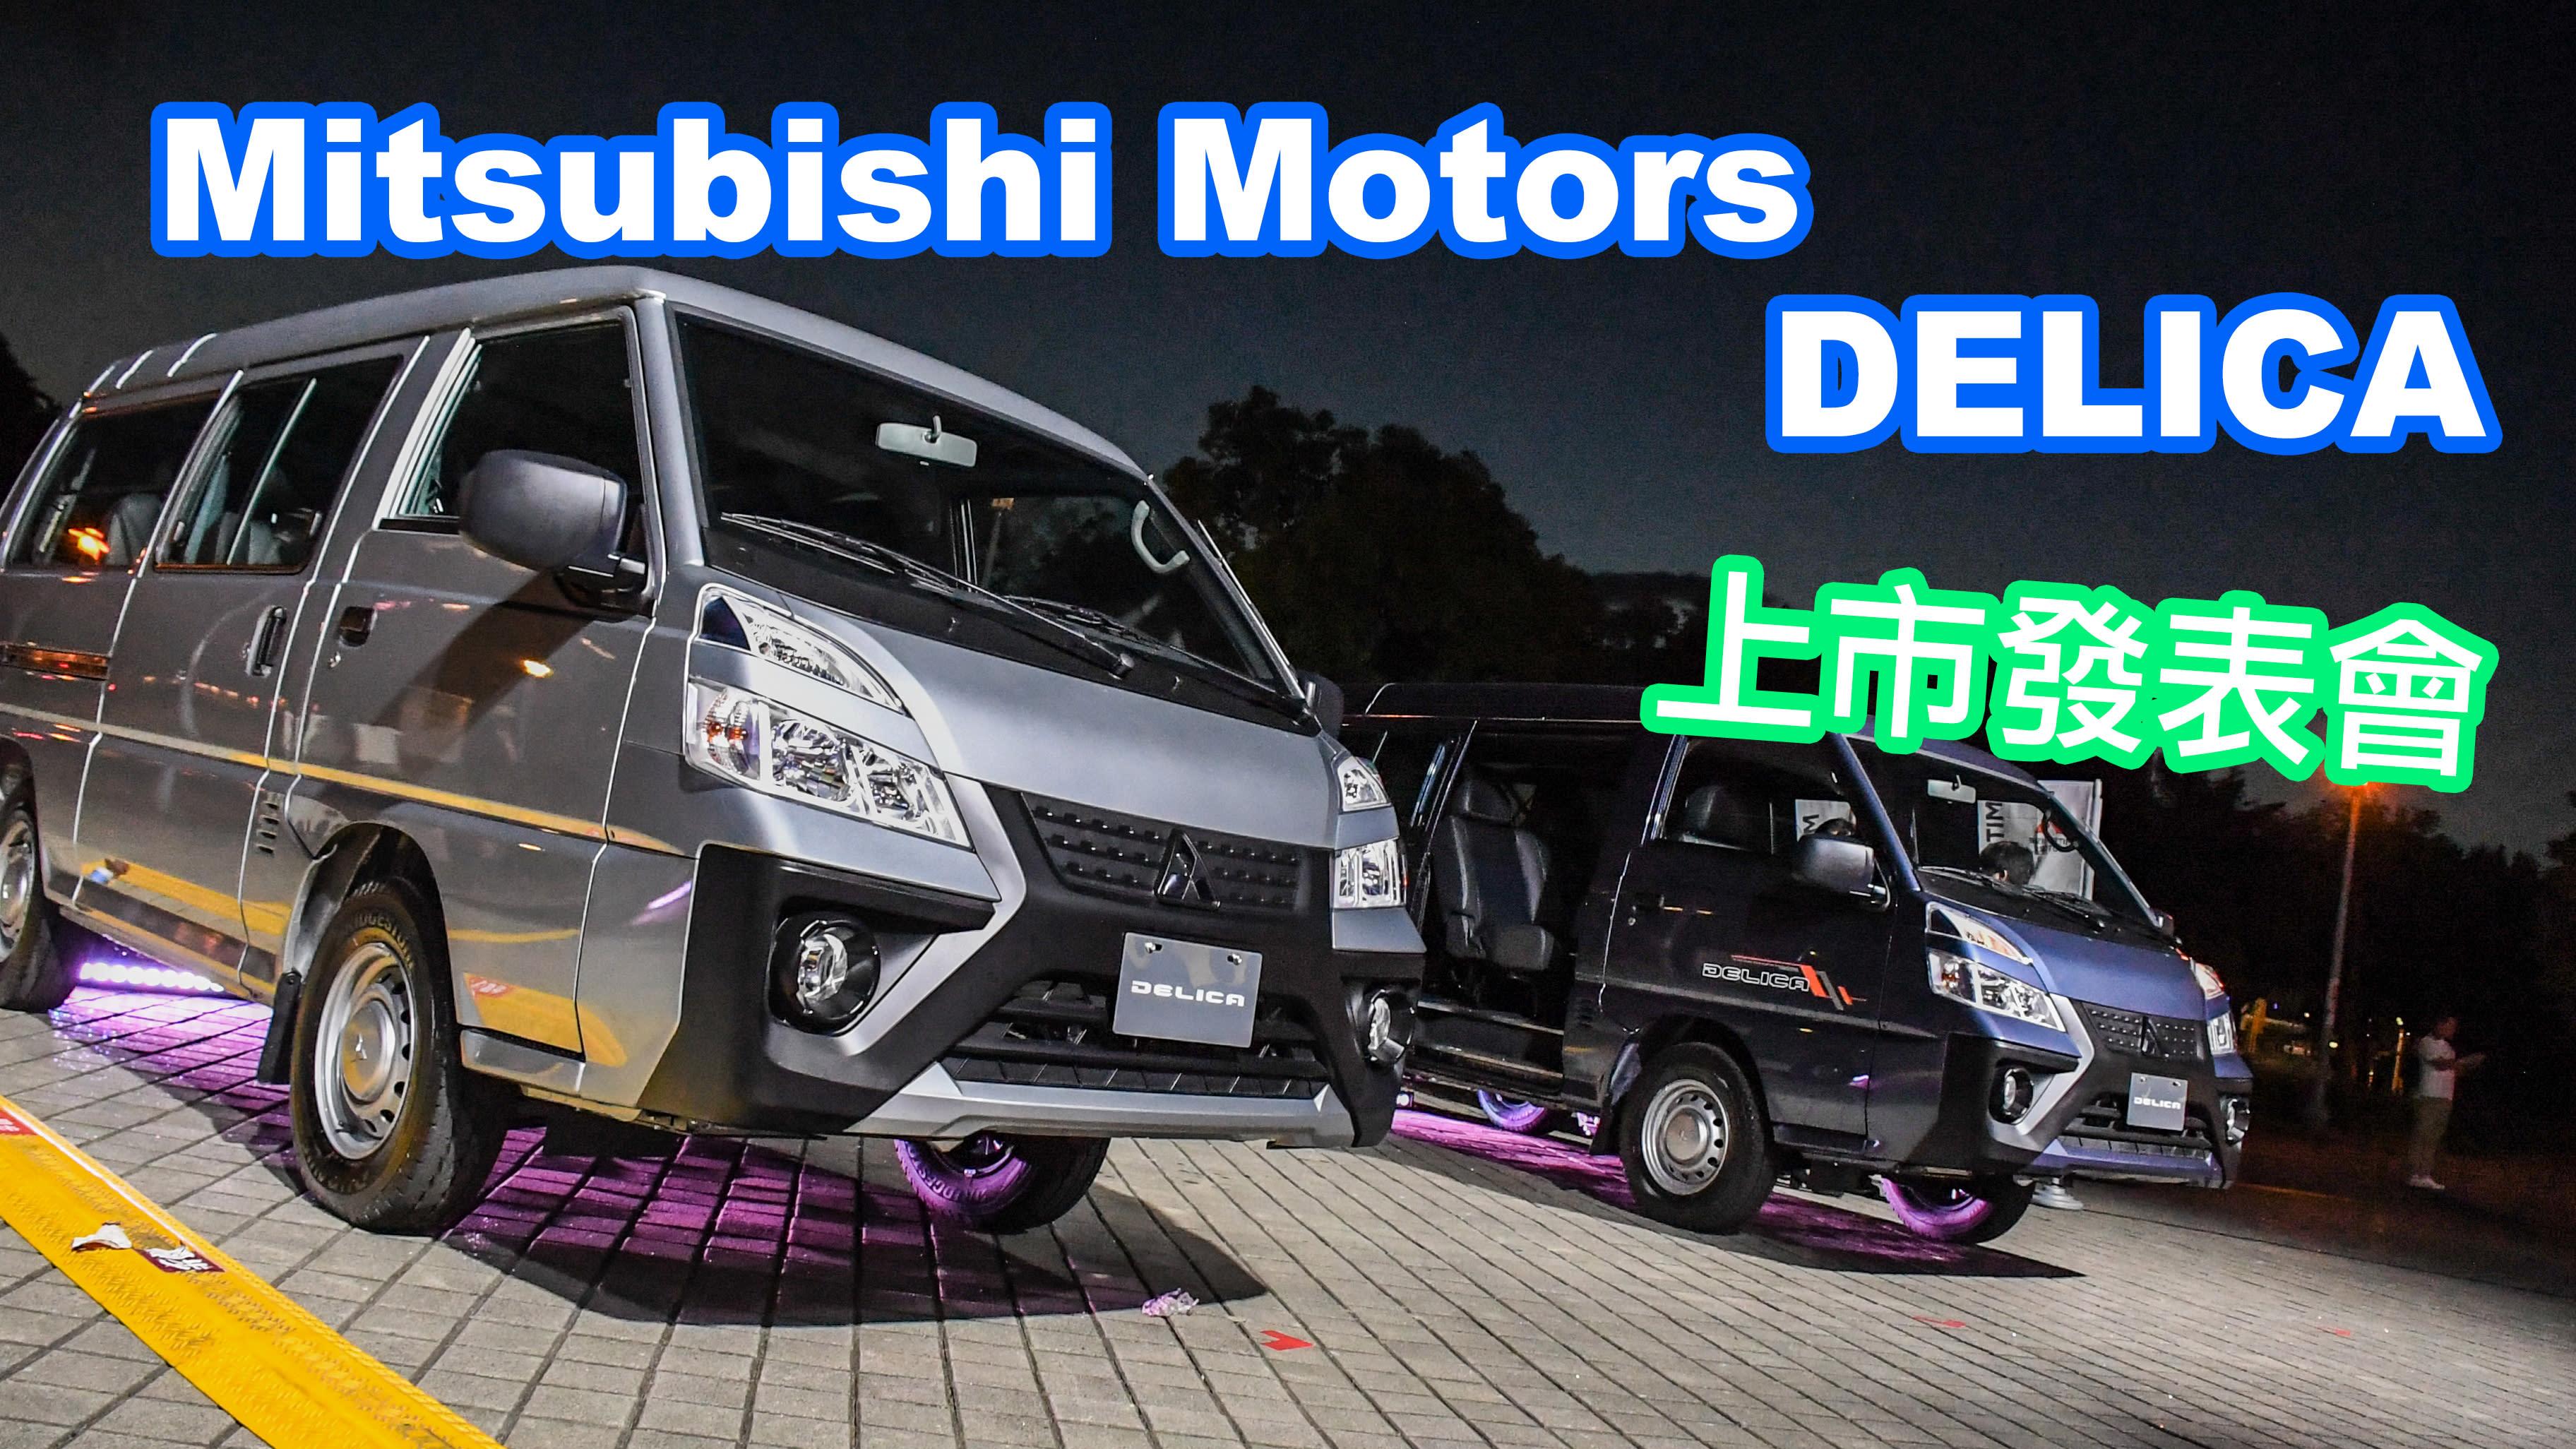 頭家照過來!安全生財最佳夥伴|Mitsubishi Motors Delica 上市發表